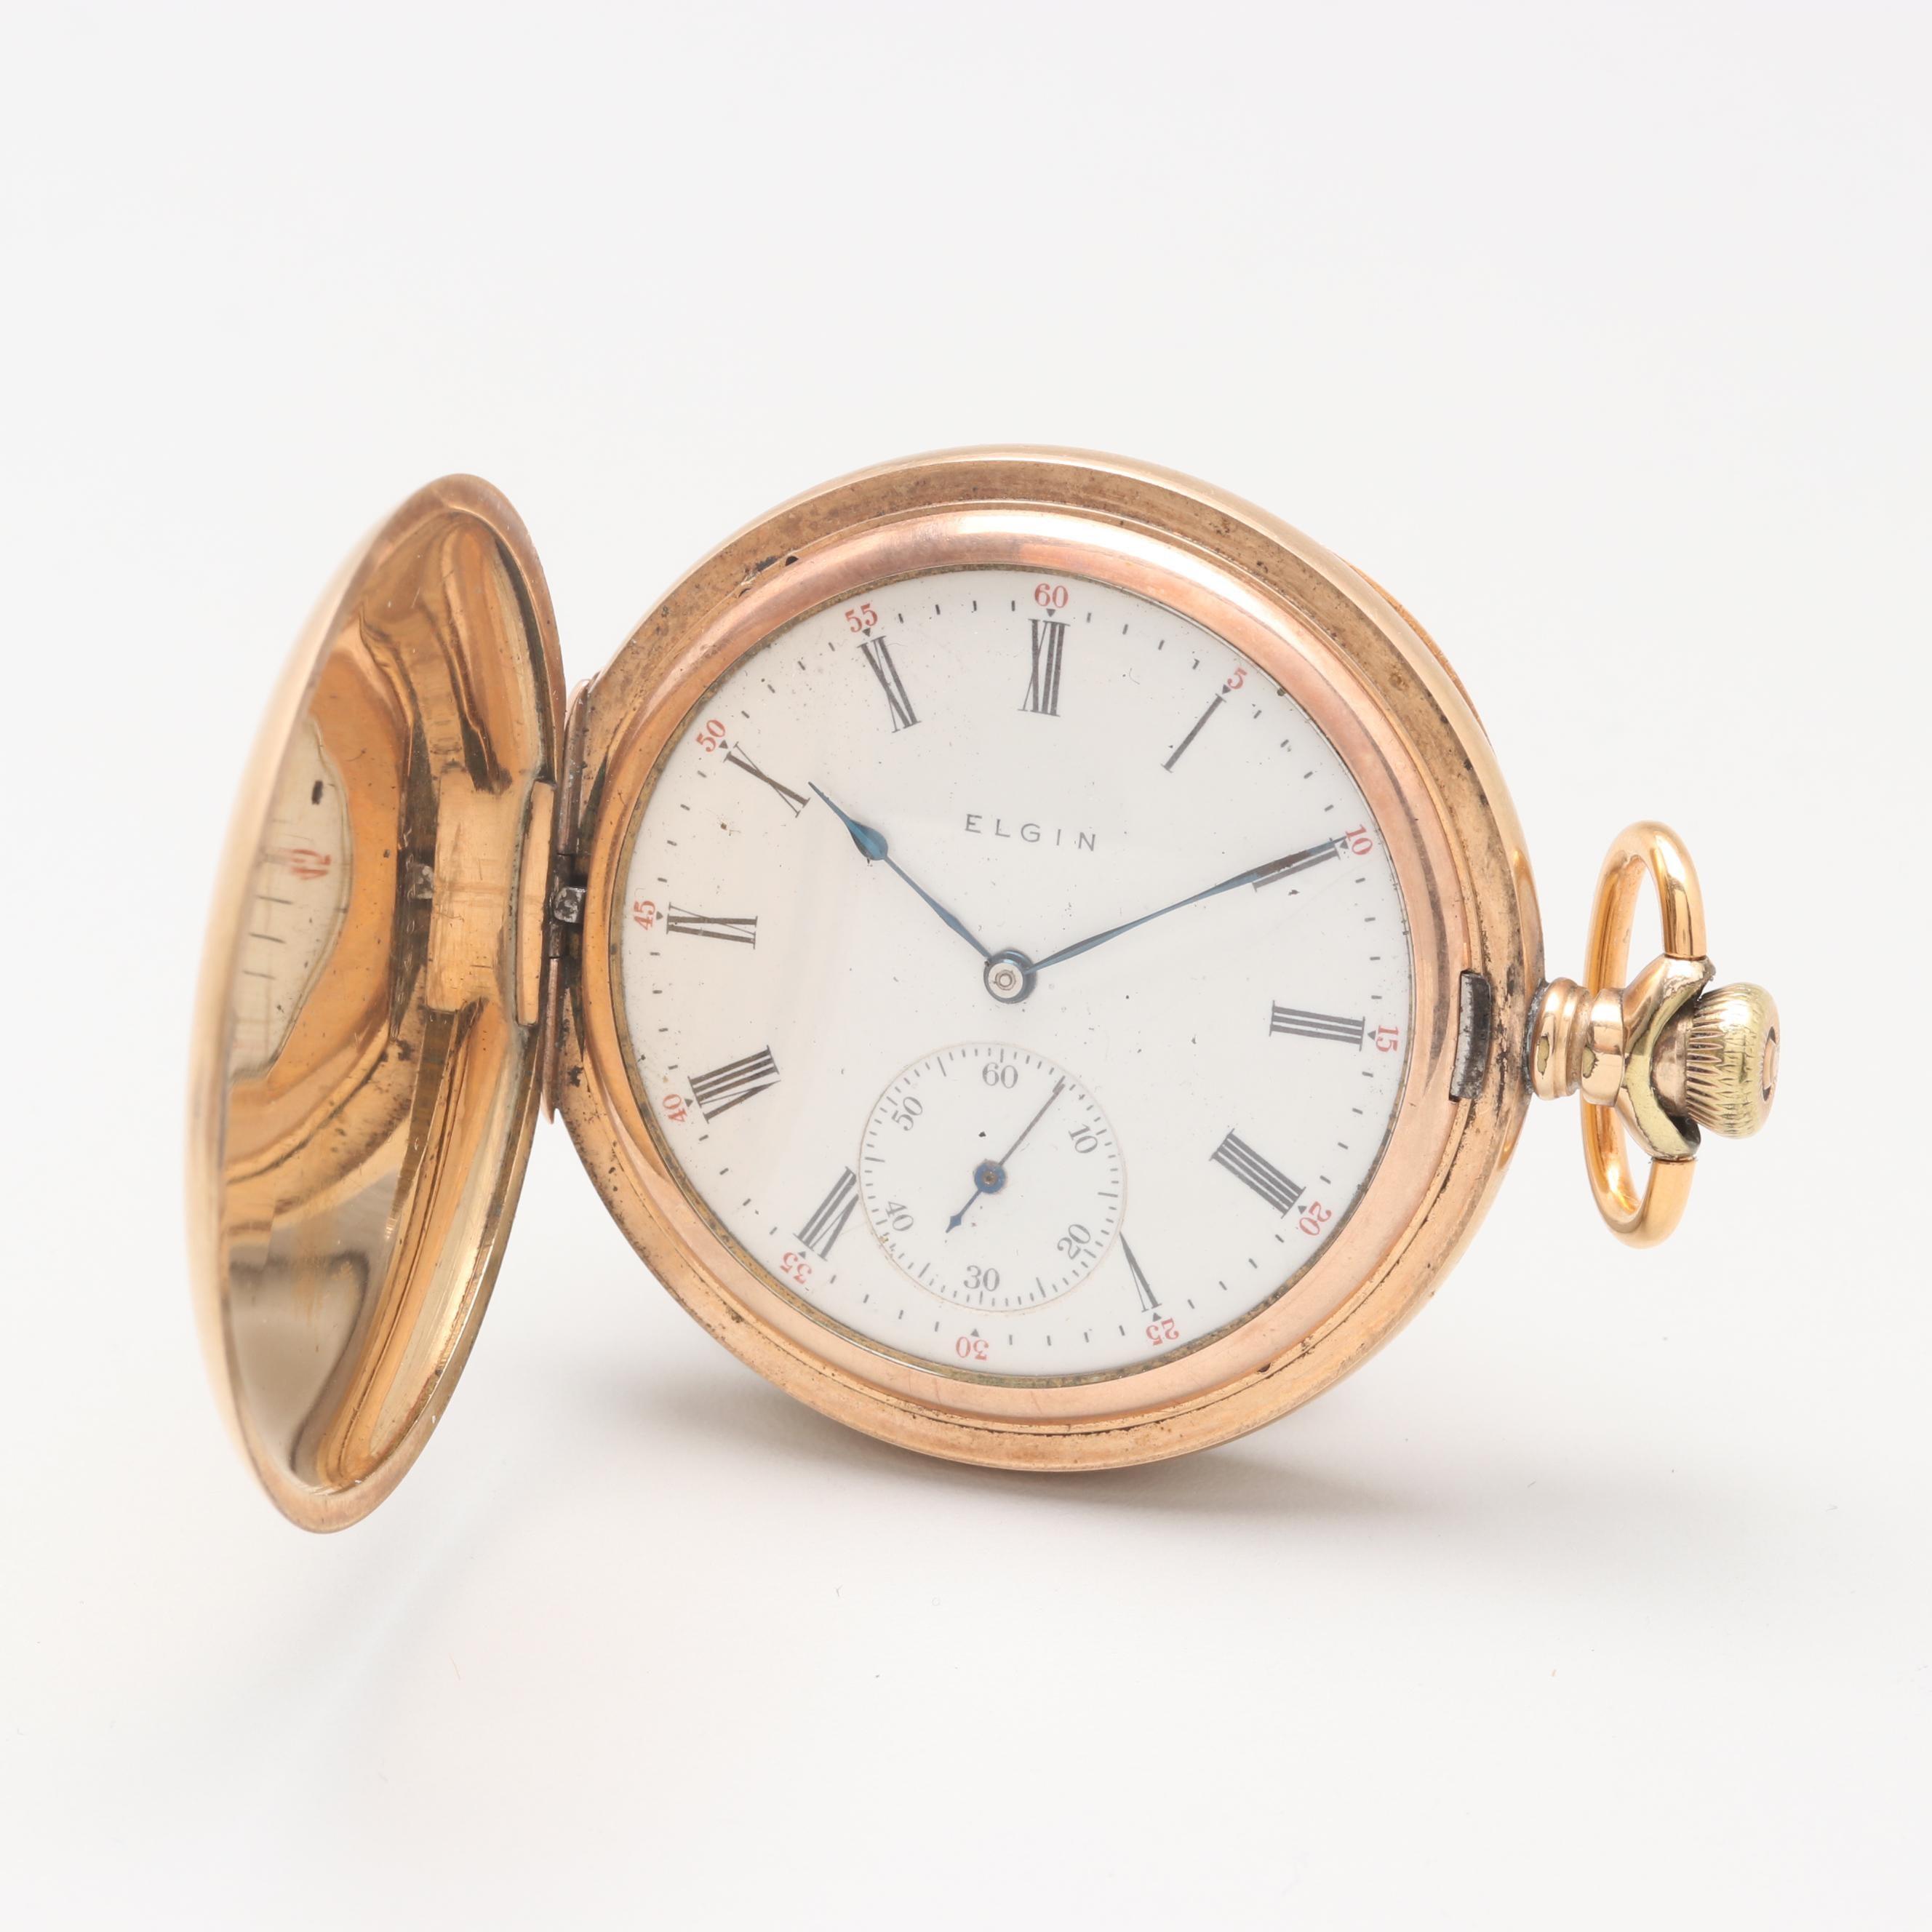 Circa 1907 Elgin Gold Filled Hunting Case Pocket Watch